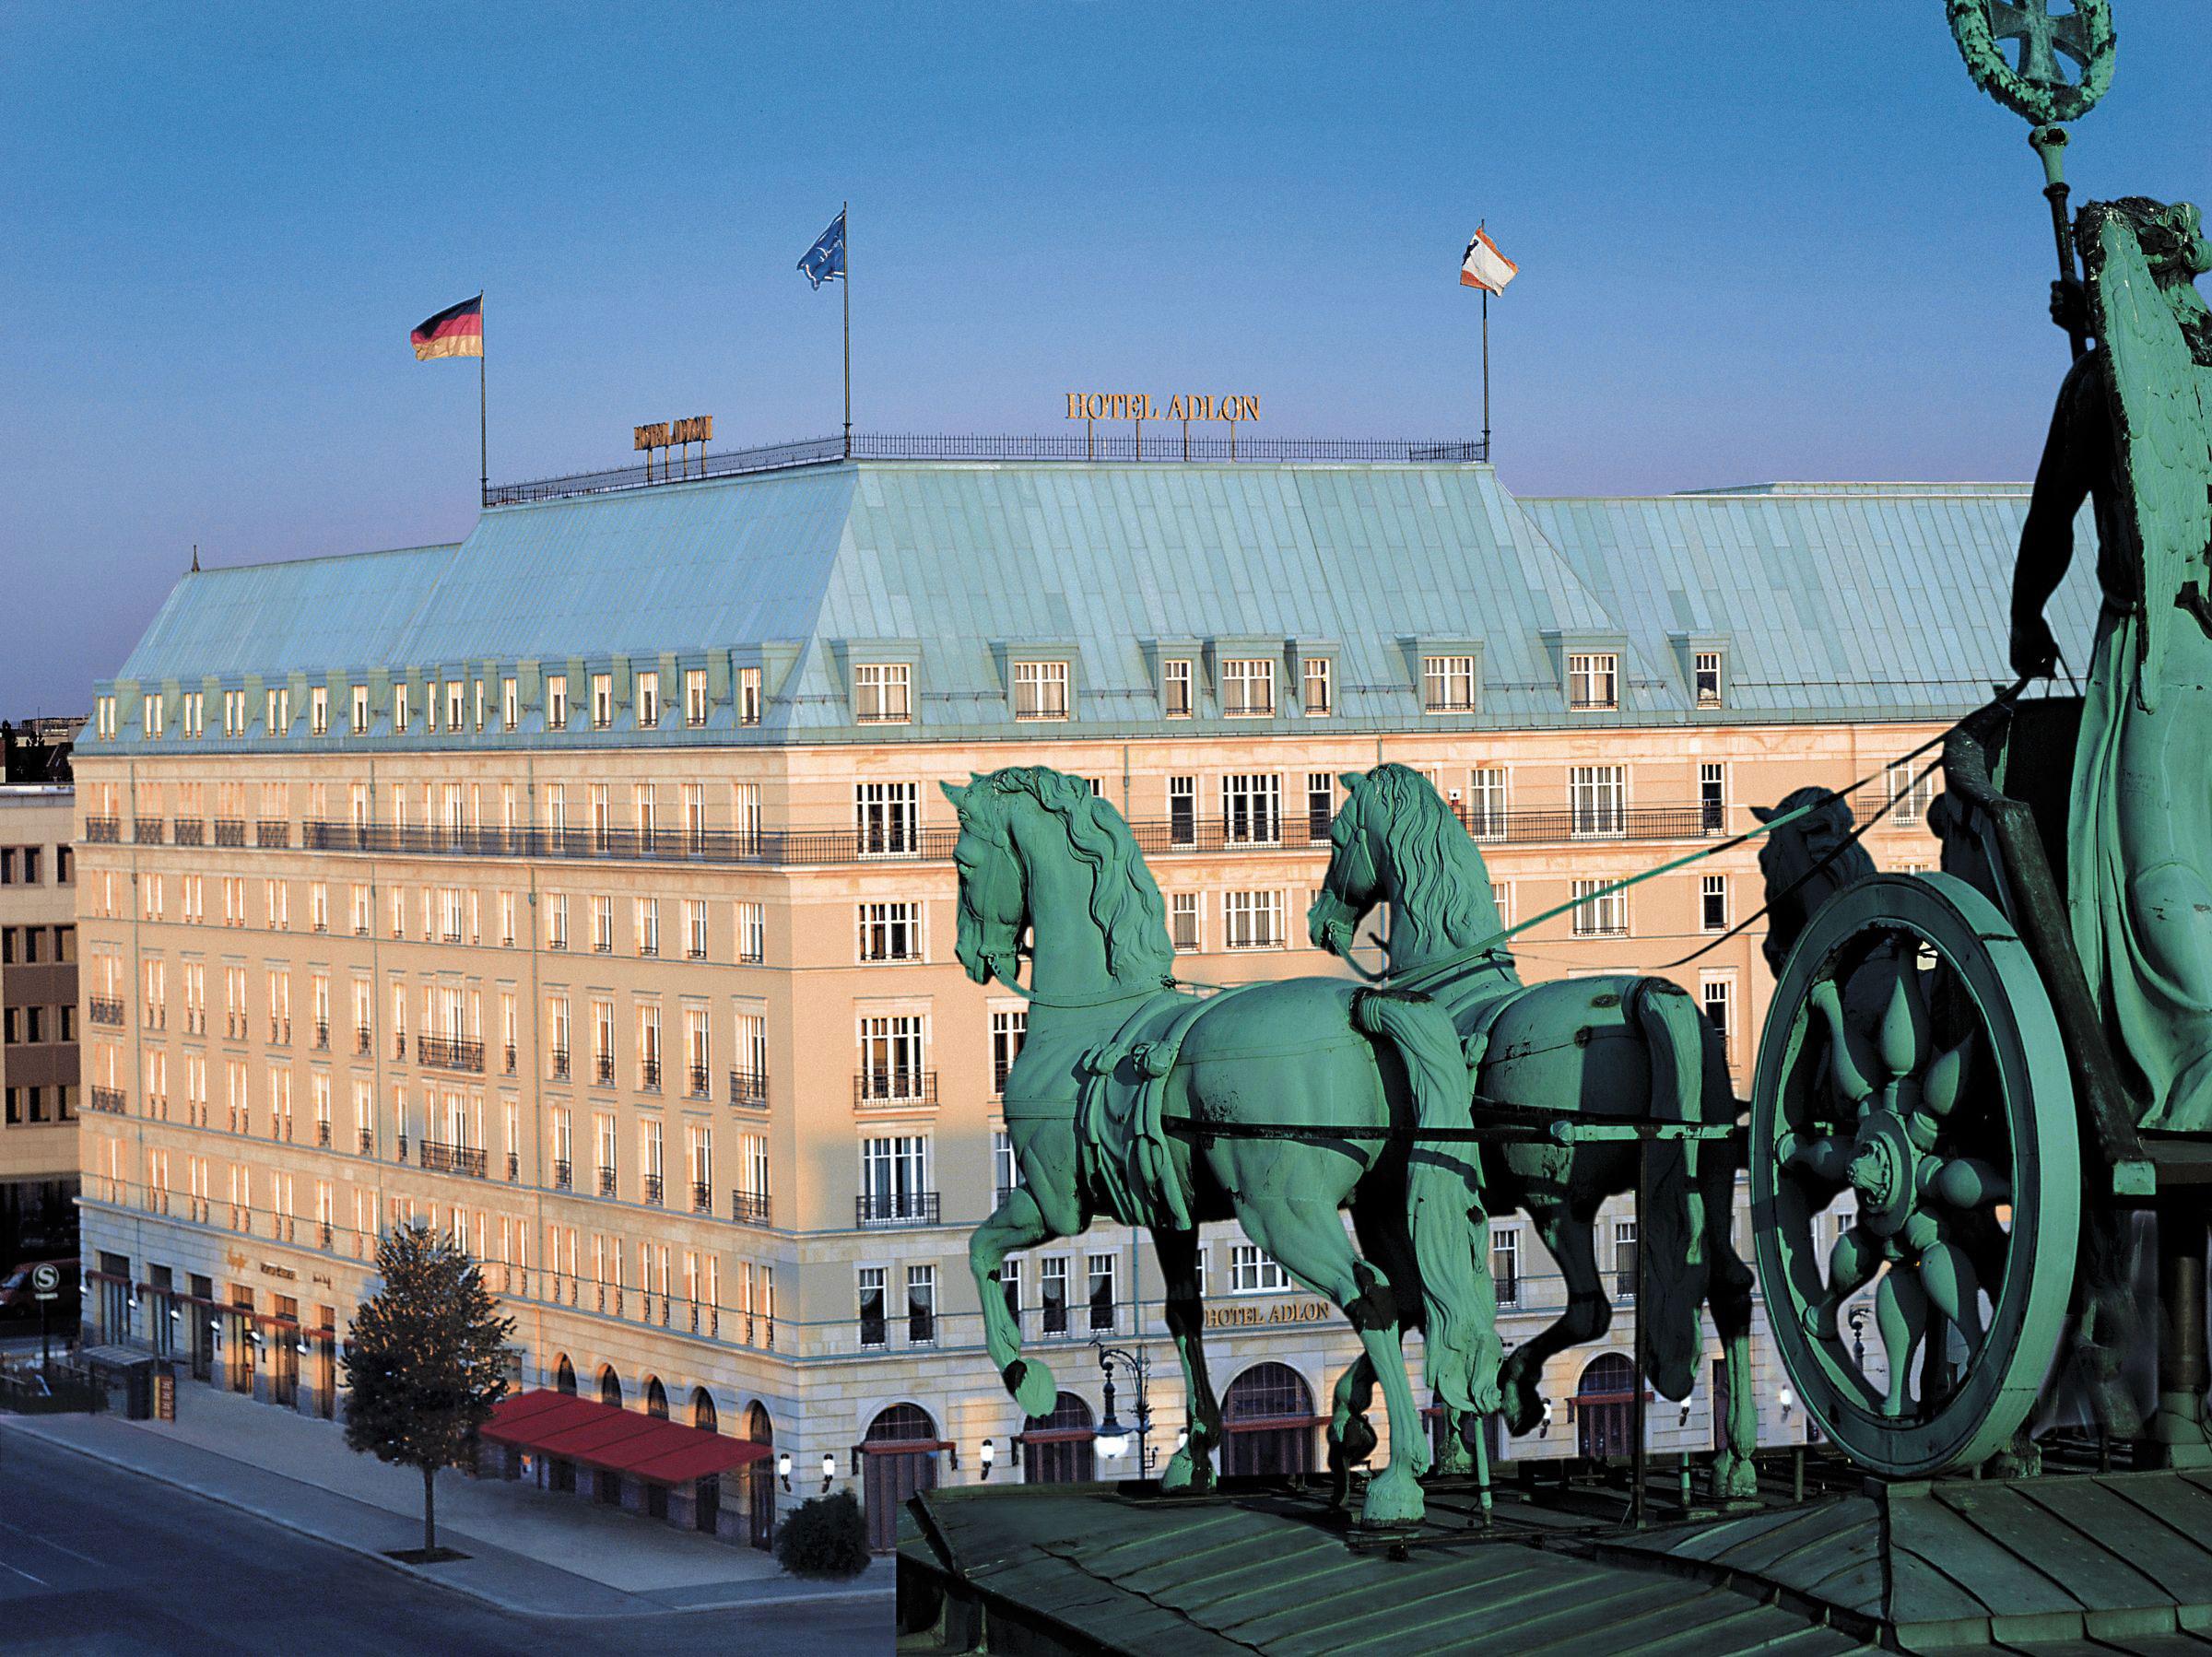 Jamie Ndah Experiences A Luxurious Stay In Beautiful Berlin